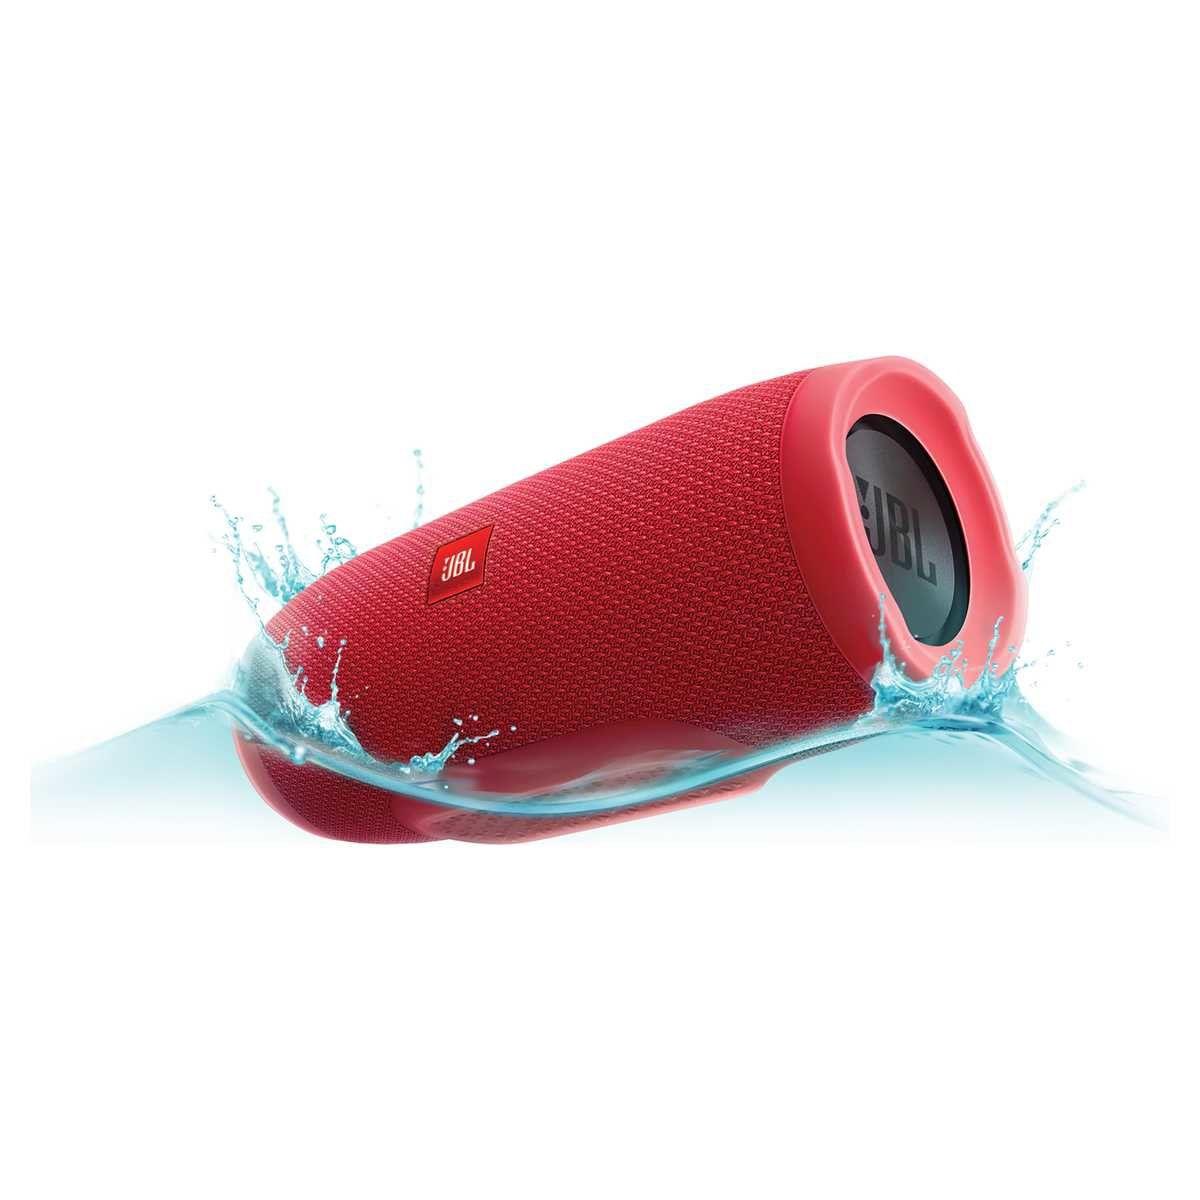 Caixa De Som Jbl Charge 3 Red Portátil Bluetooth